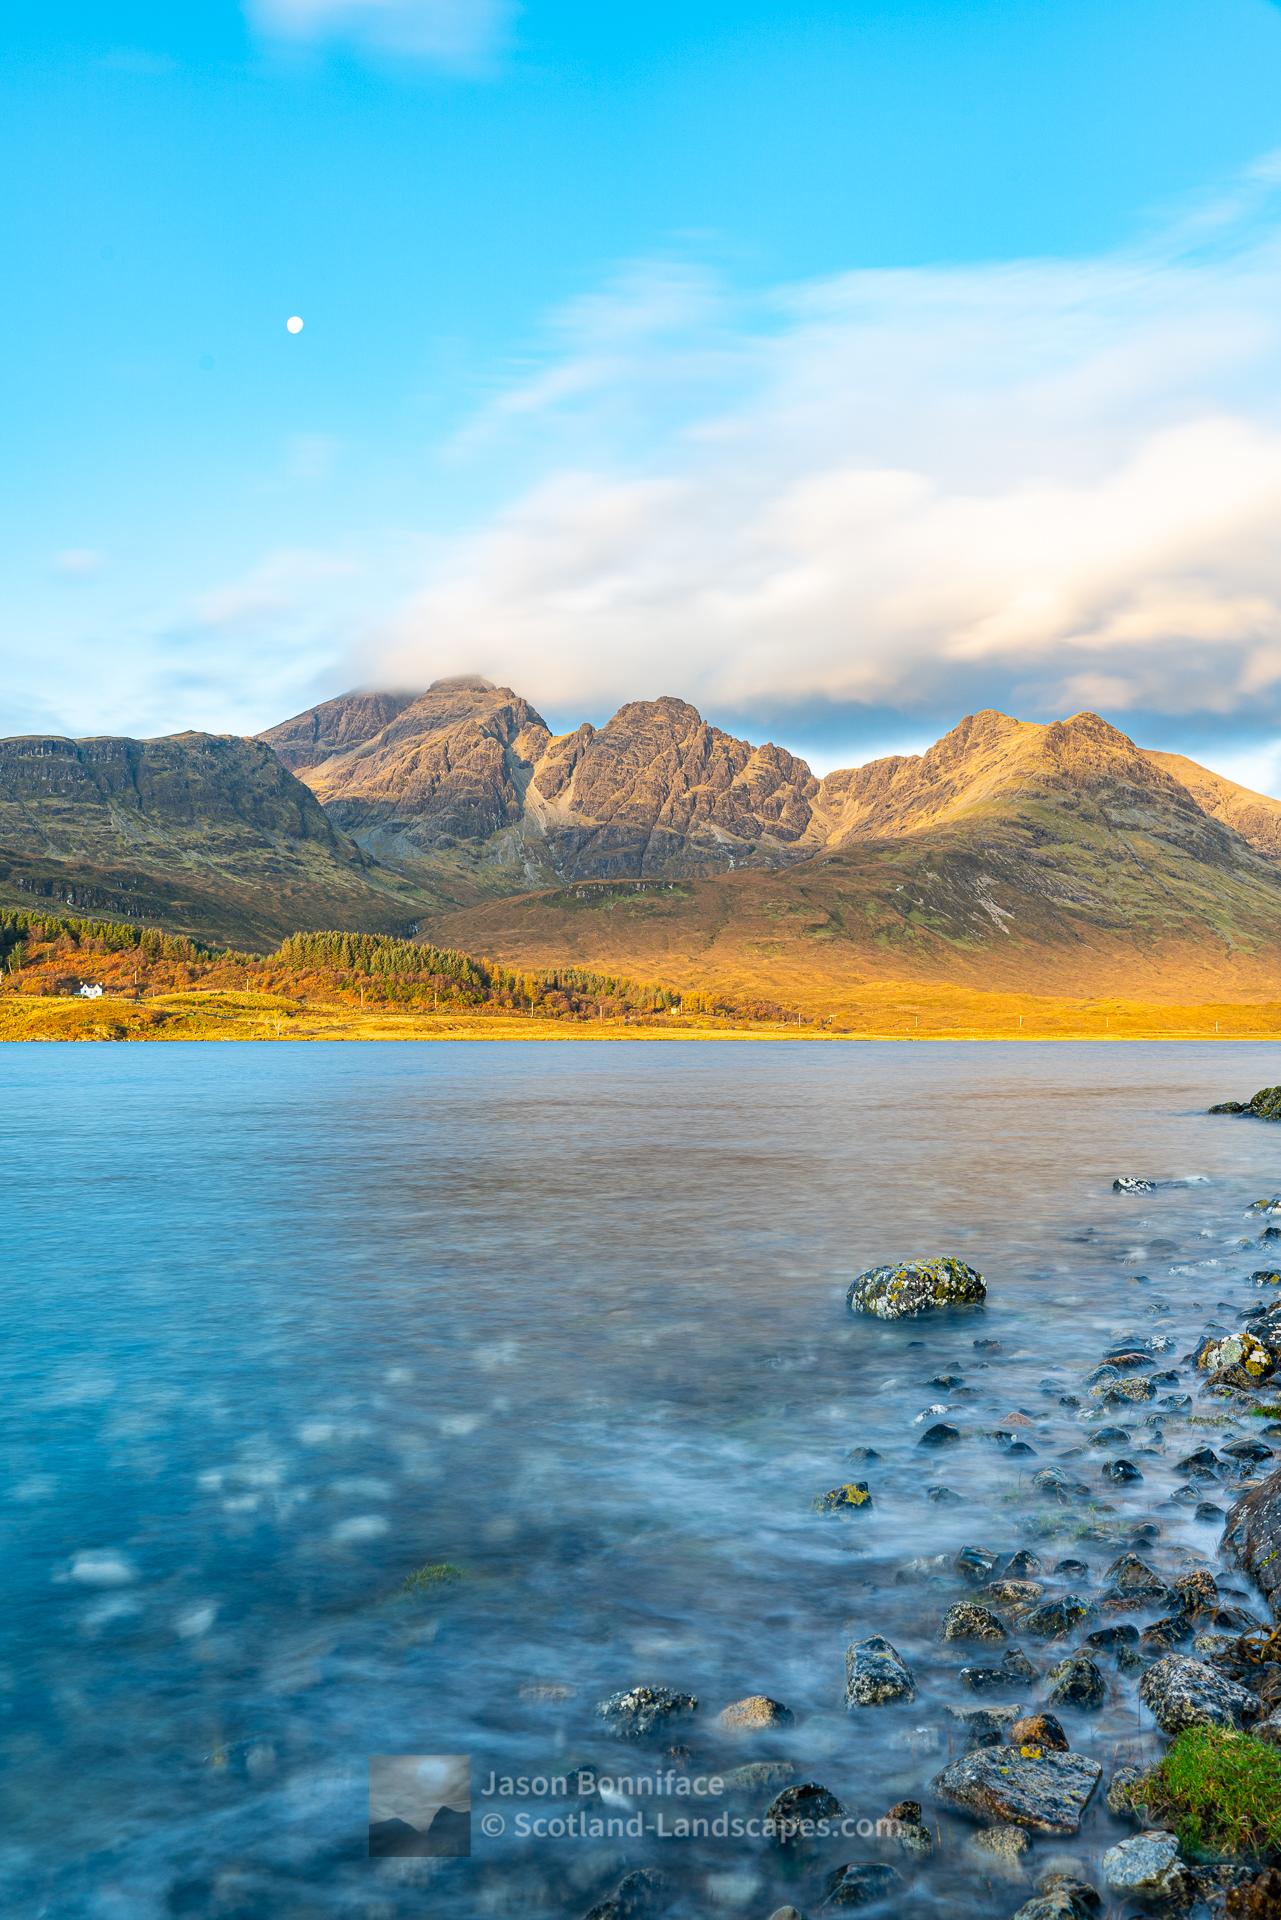 Morning - Loch Slapin and Bla Bheinn, Skye